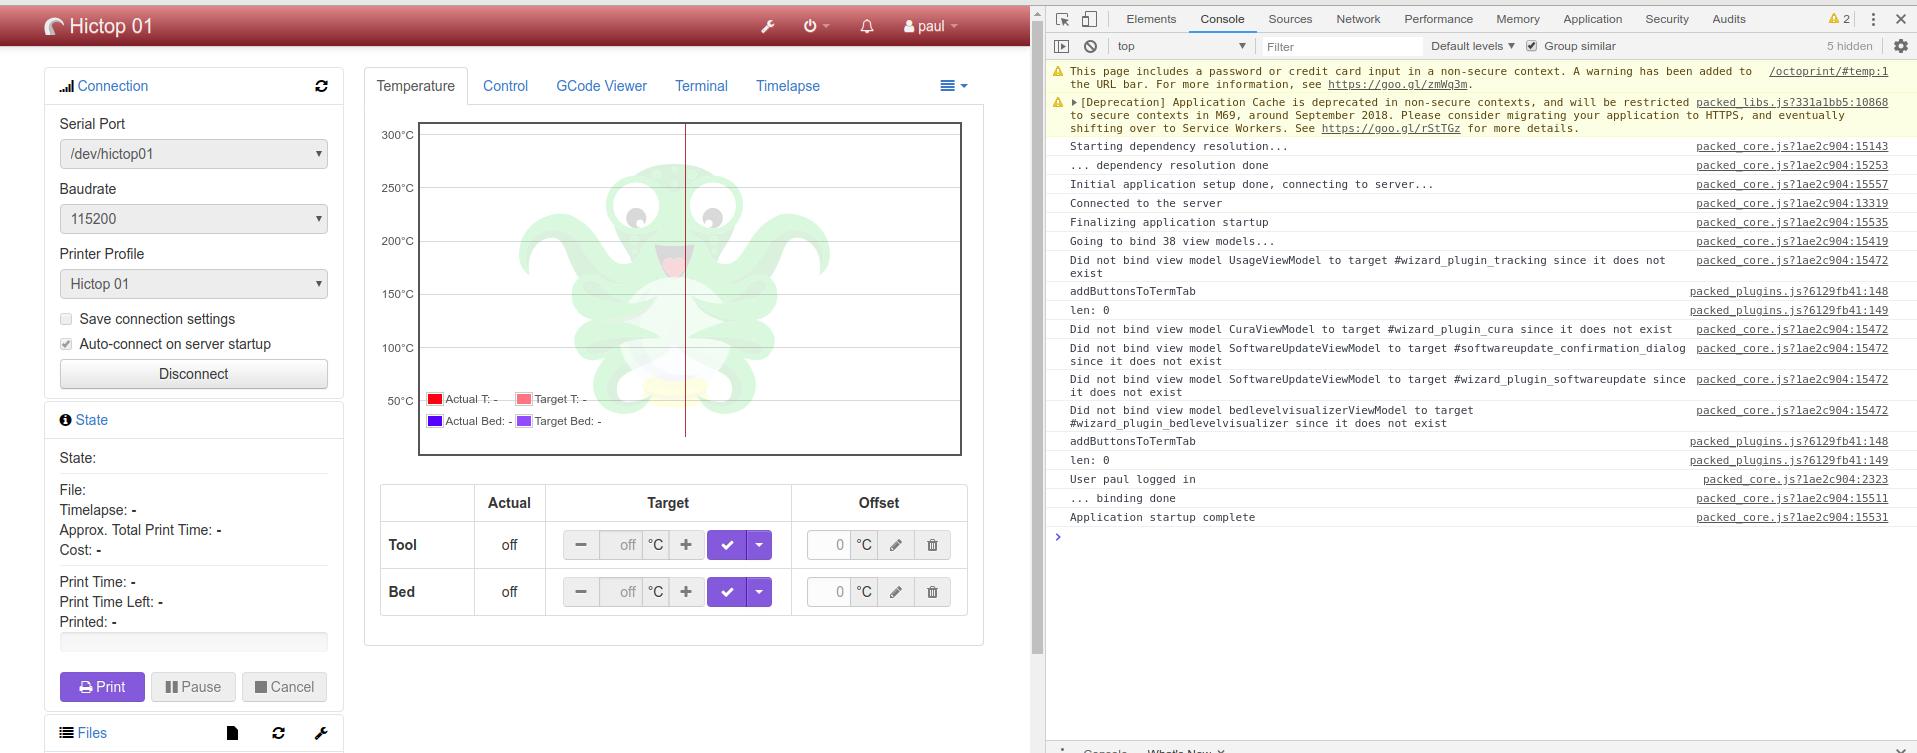 1 3 10rc4?] Websocket errors when using Apache reverse proxy